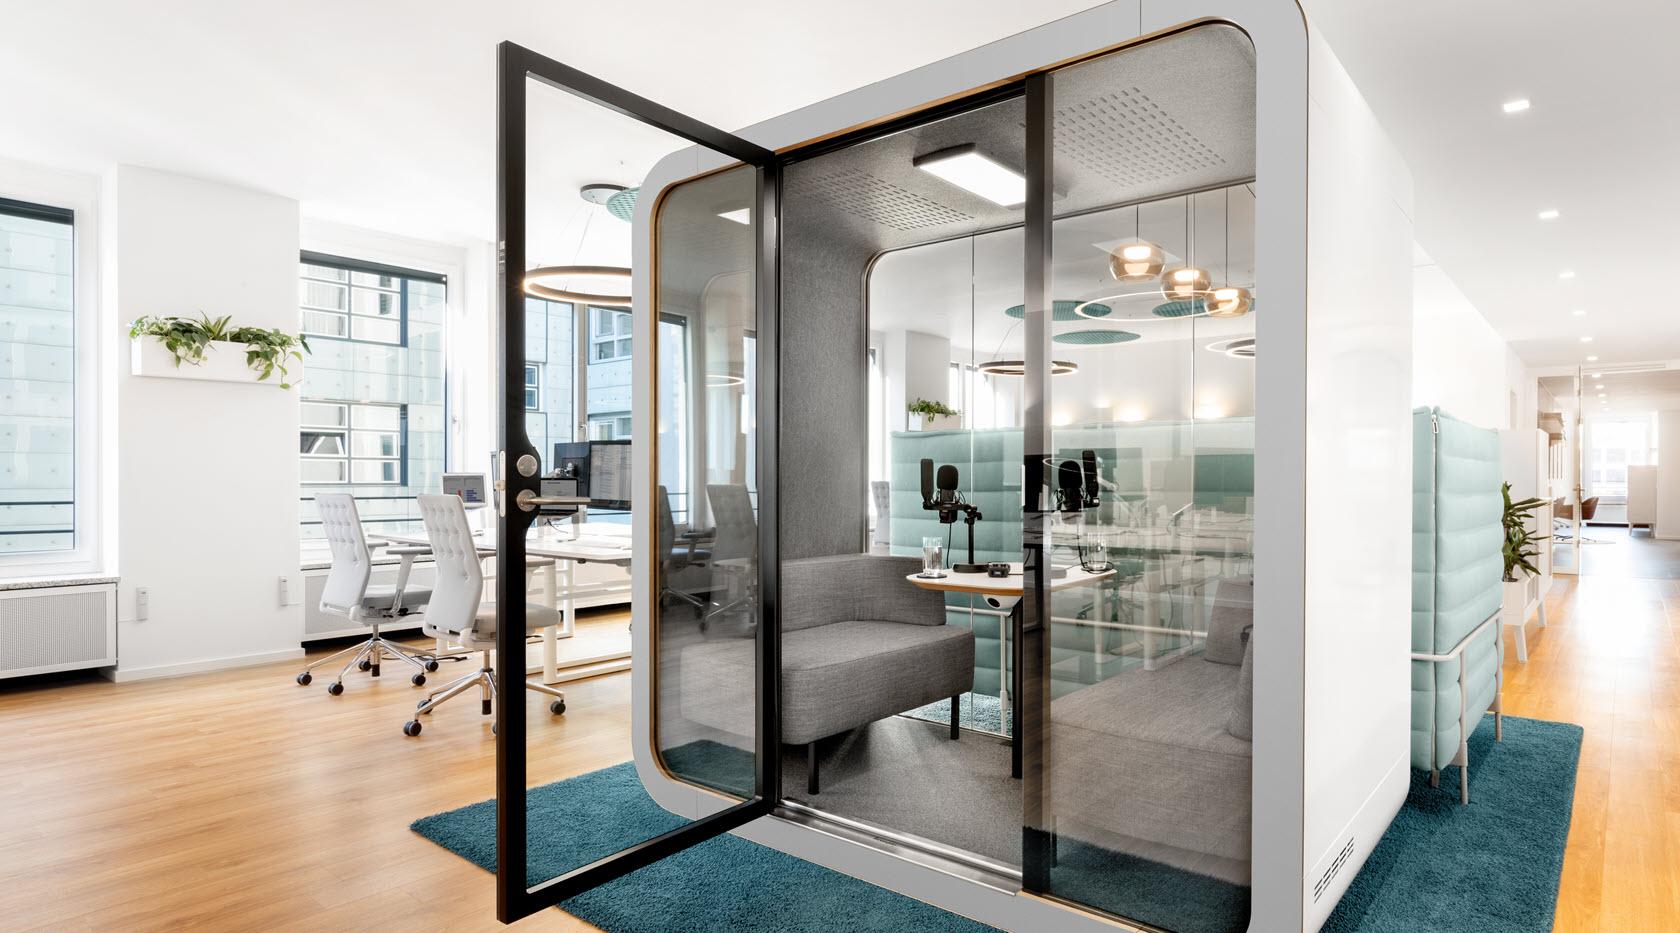 Piabo Referenz: Multispace Büro, Telefonzelle, Meetingsraum.